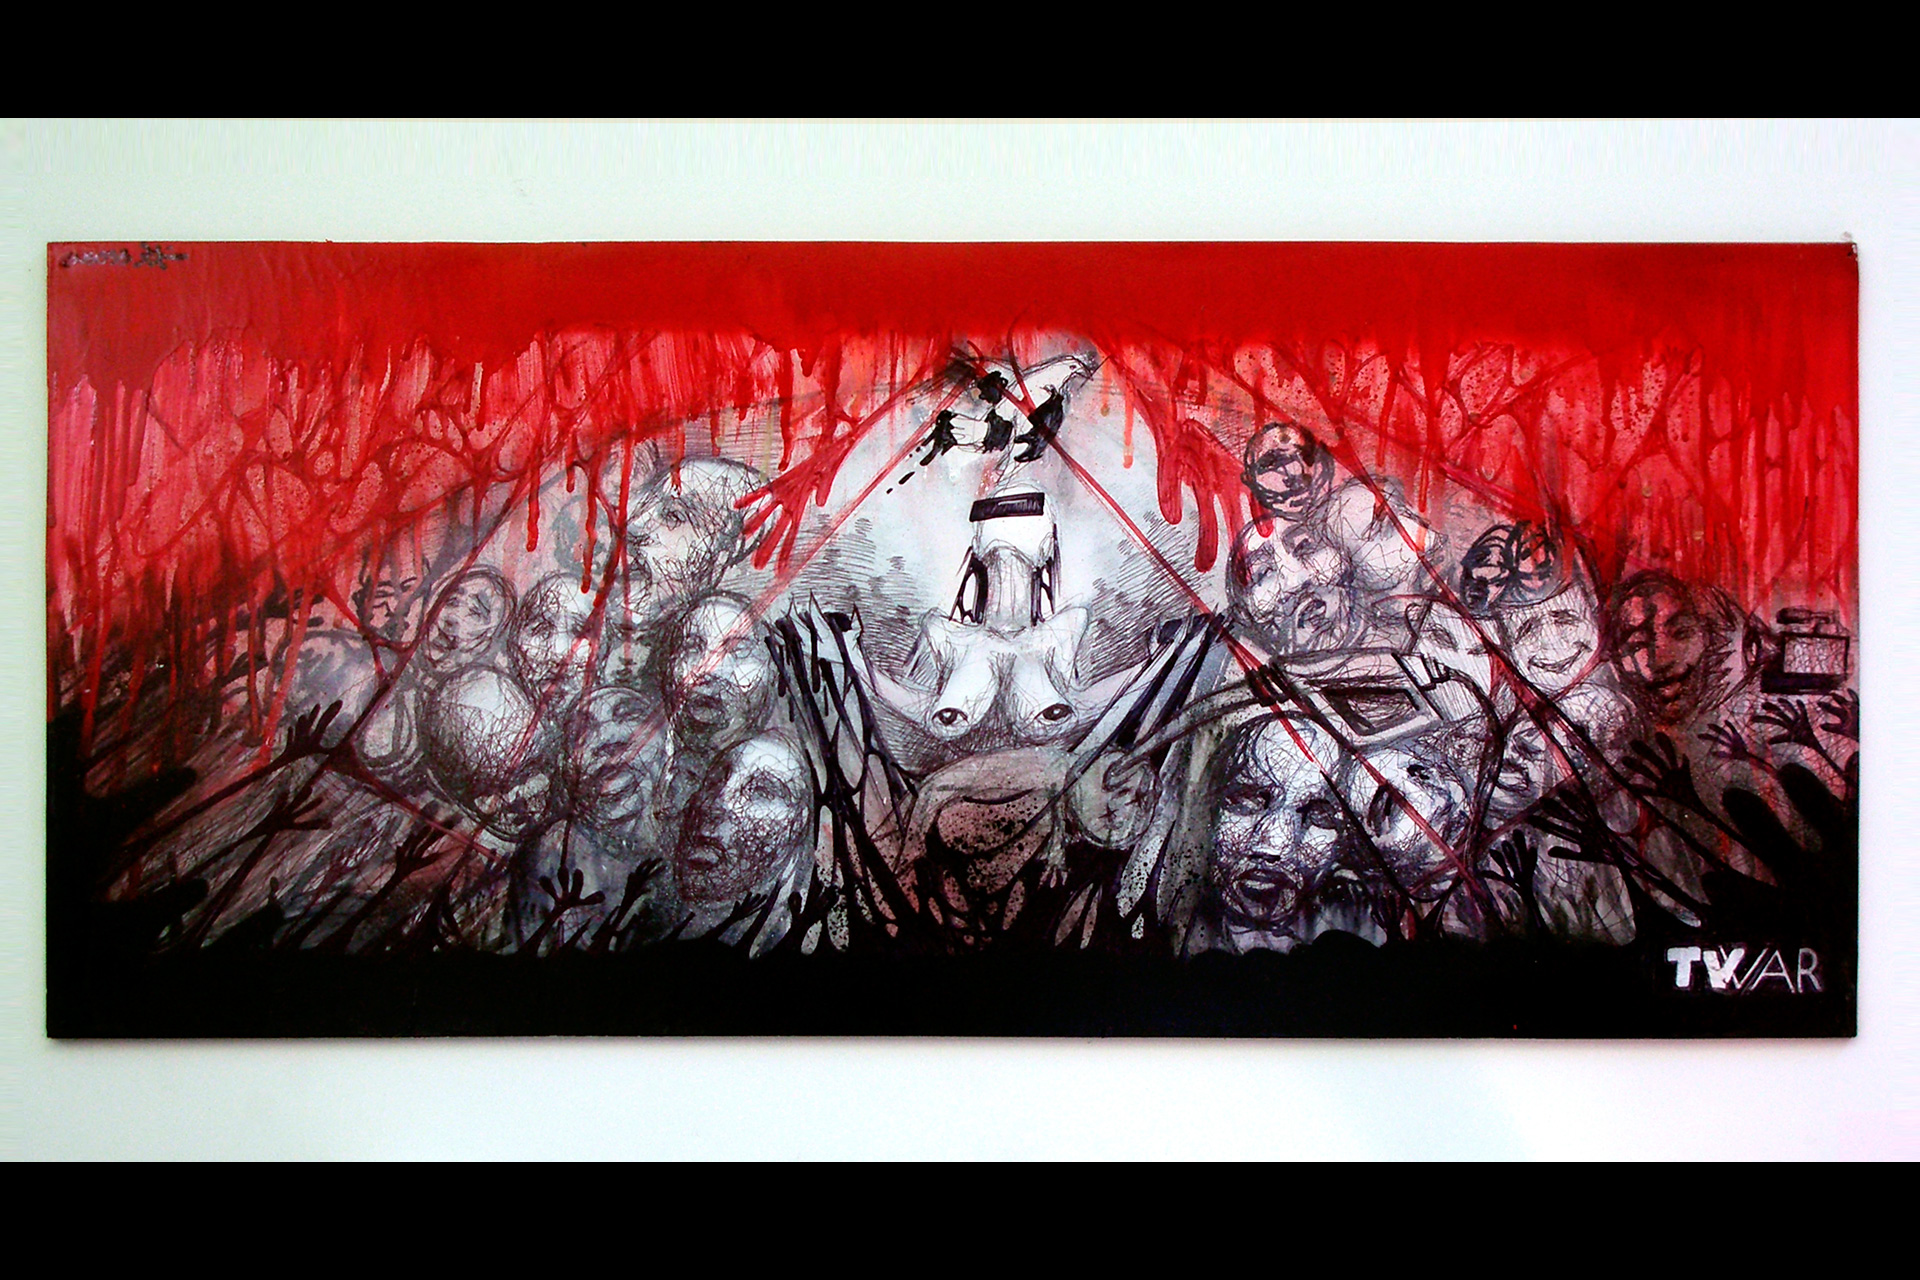 SUSO33 TV War (Guernica) Spray on board